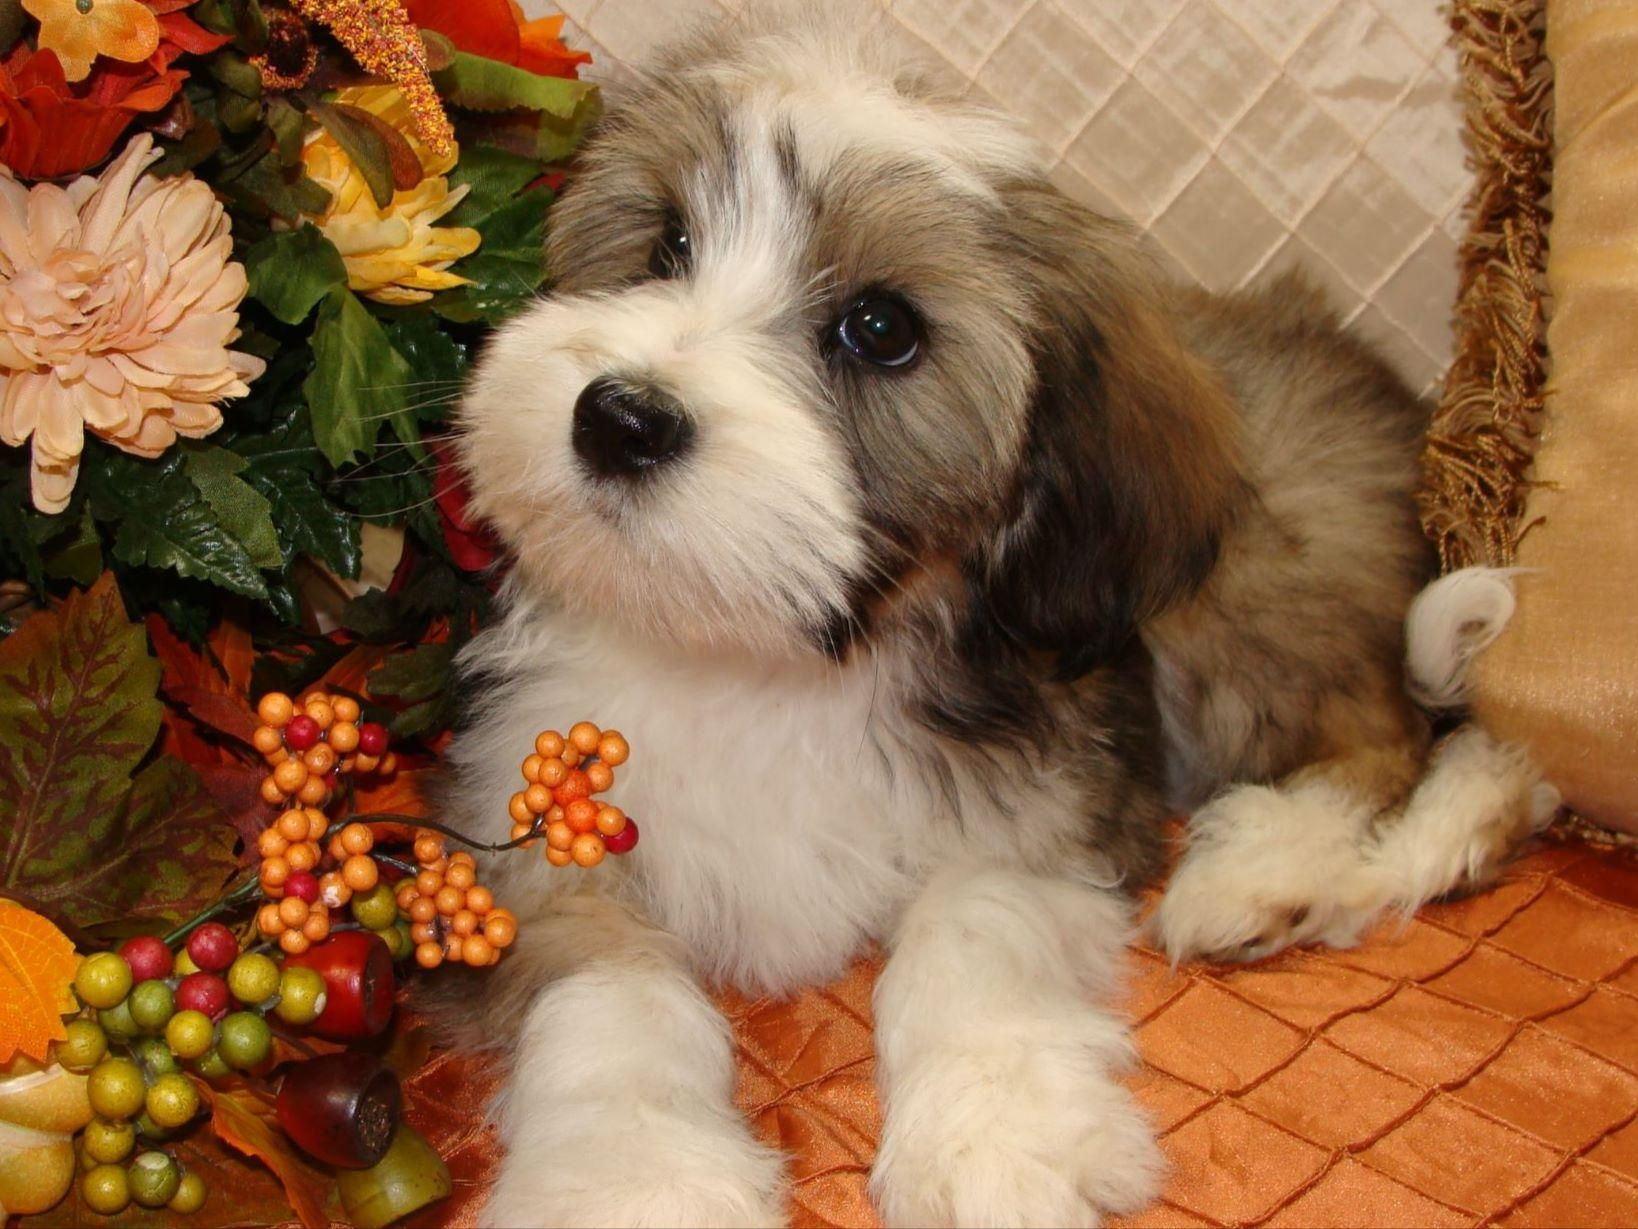 Lori Toth Domani In Lorton Va On American Kennel Club Marketplace Havanese Puppies For Sale Tibetan Terrier Havanese Puppies